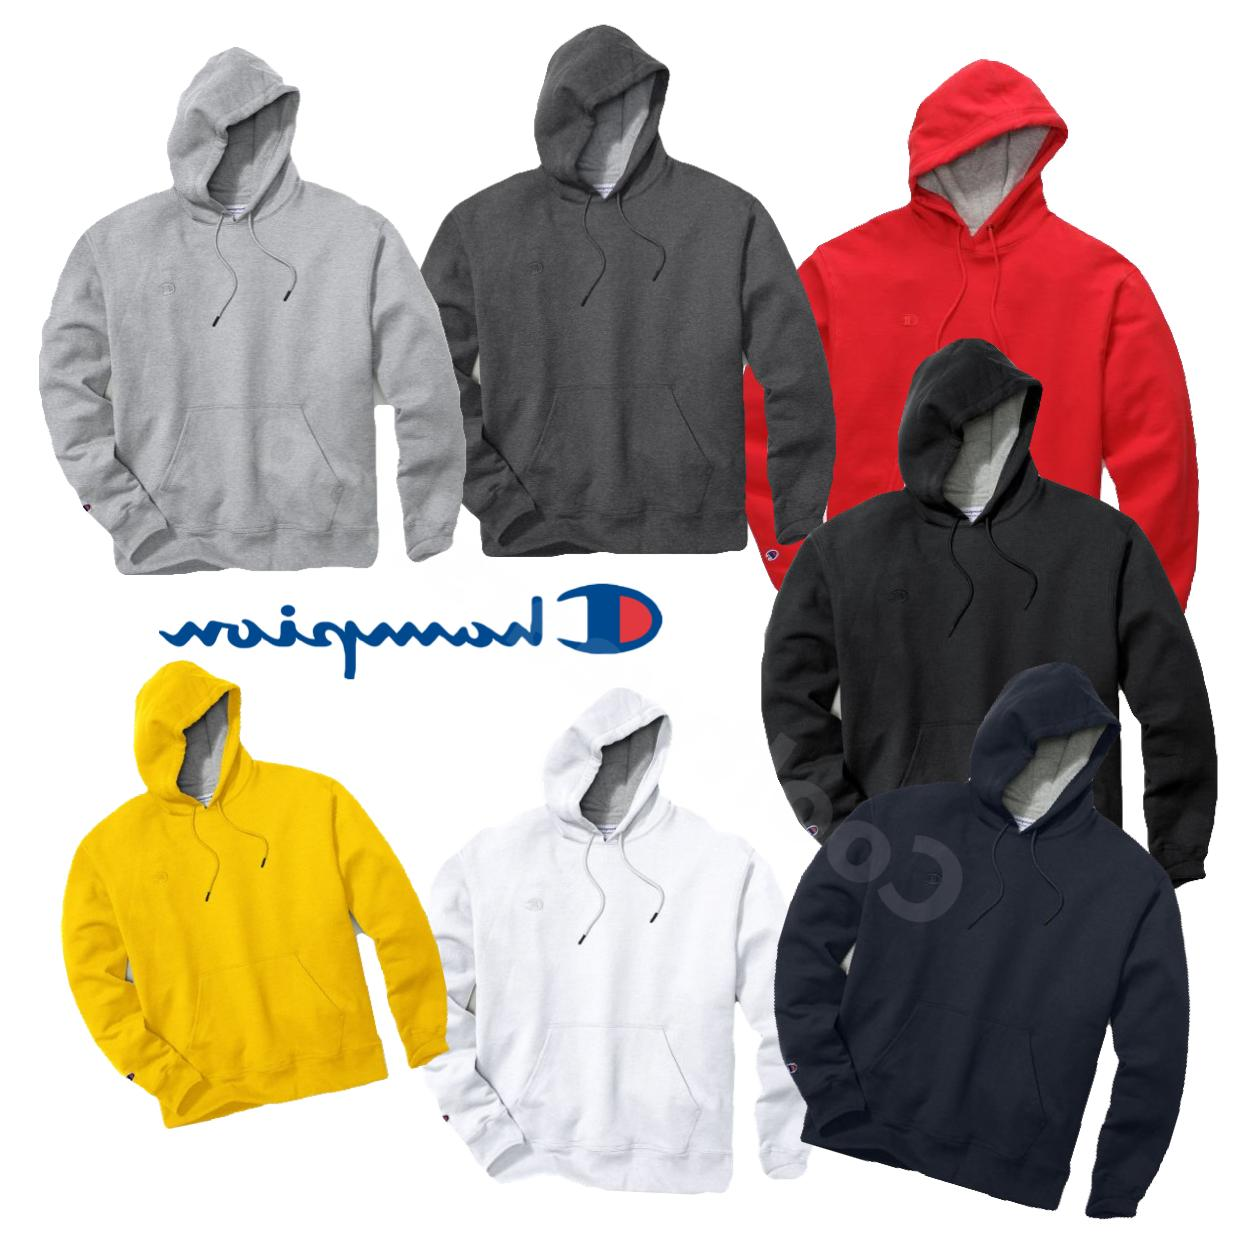 New Authentic Champion Men/'s Powerblend Fleece Pullover Hoodie S0889 407D55